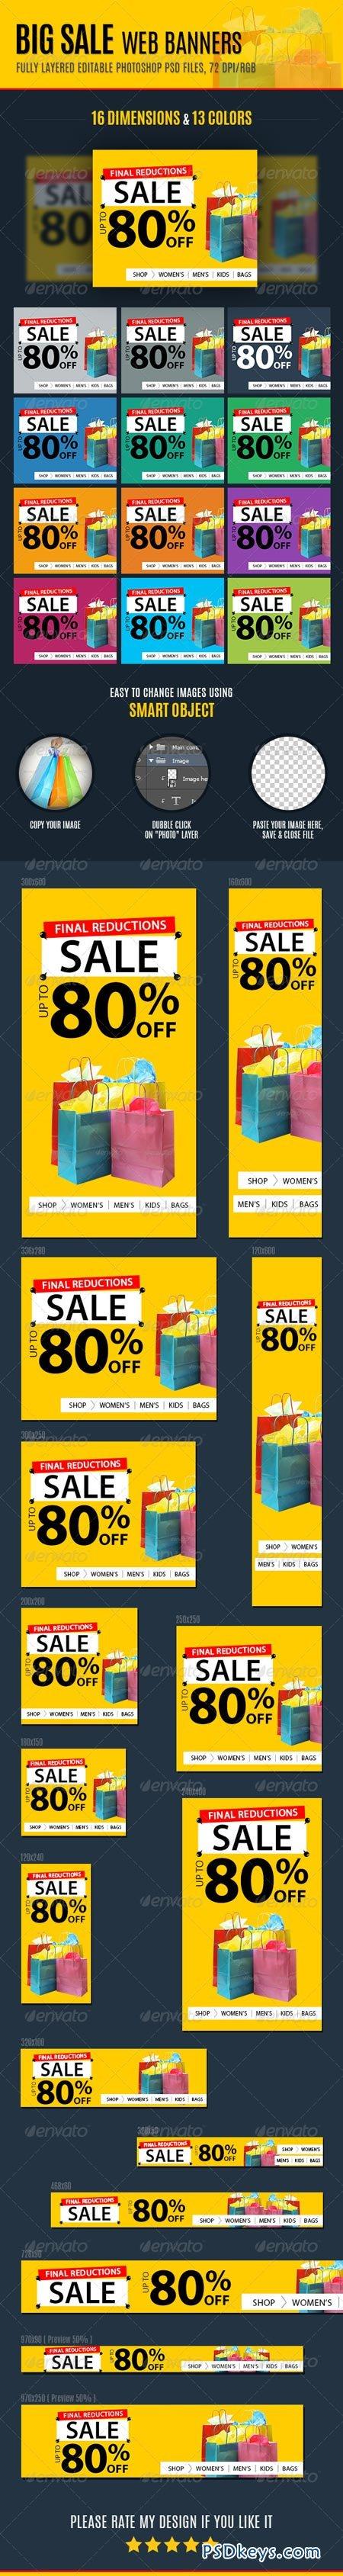 Big Sale Web Banners 7039924